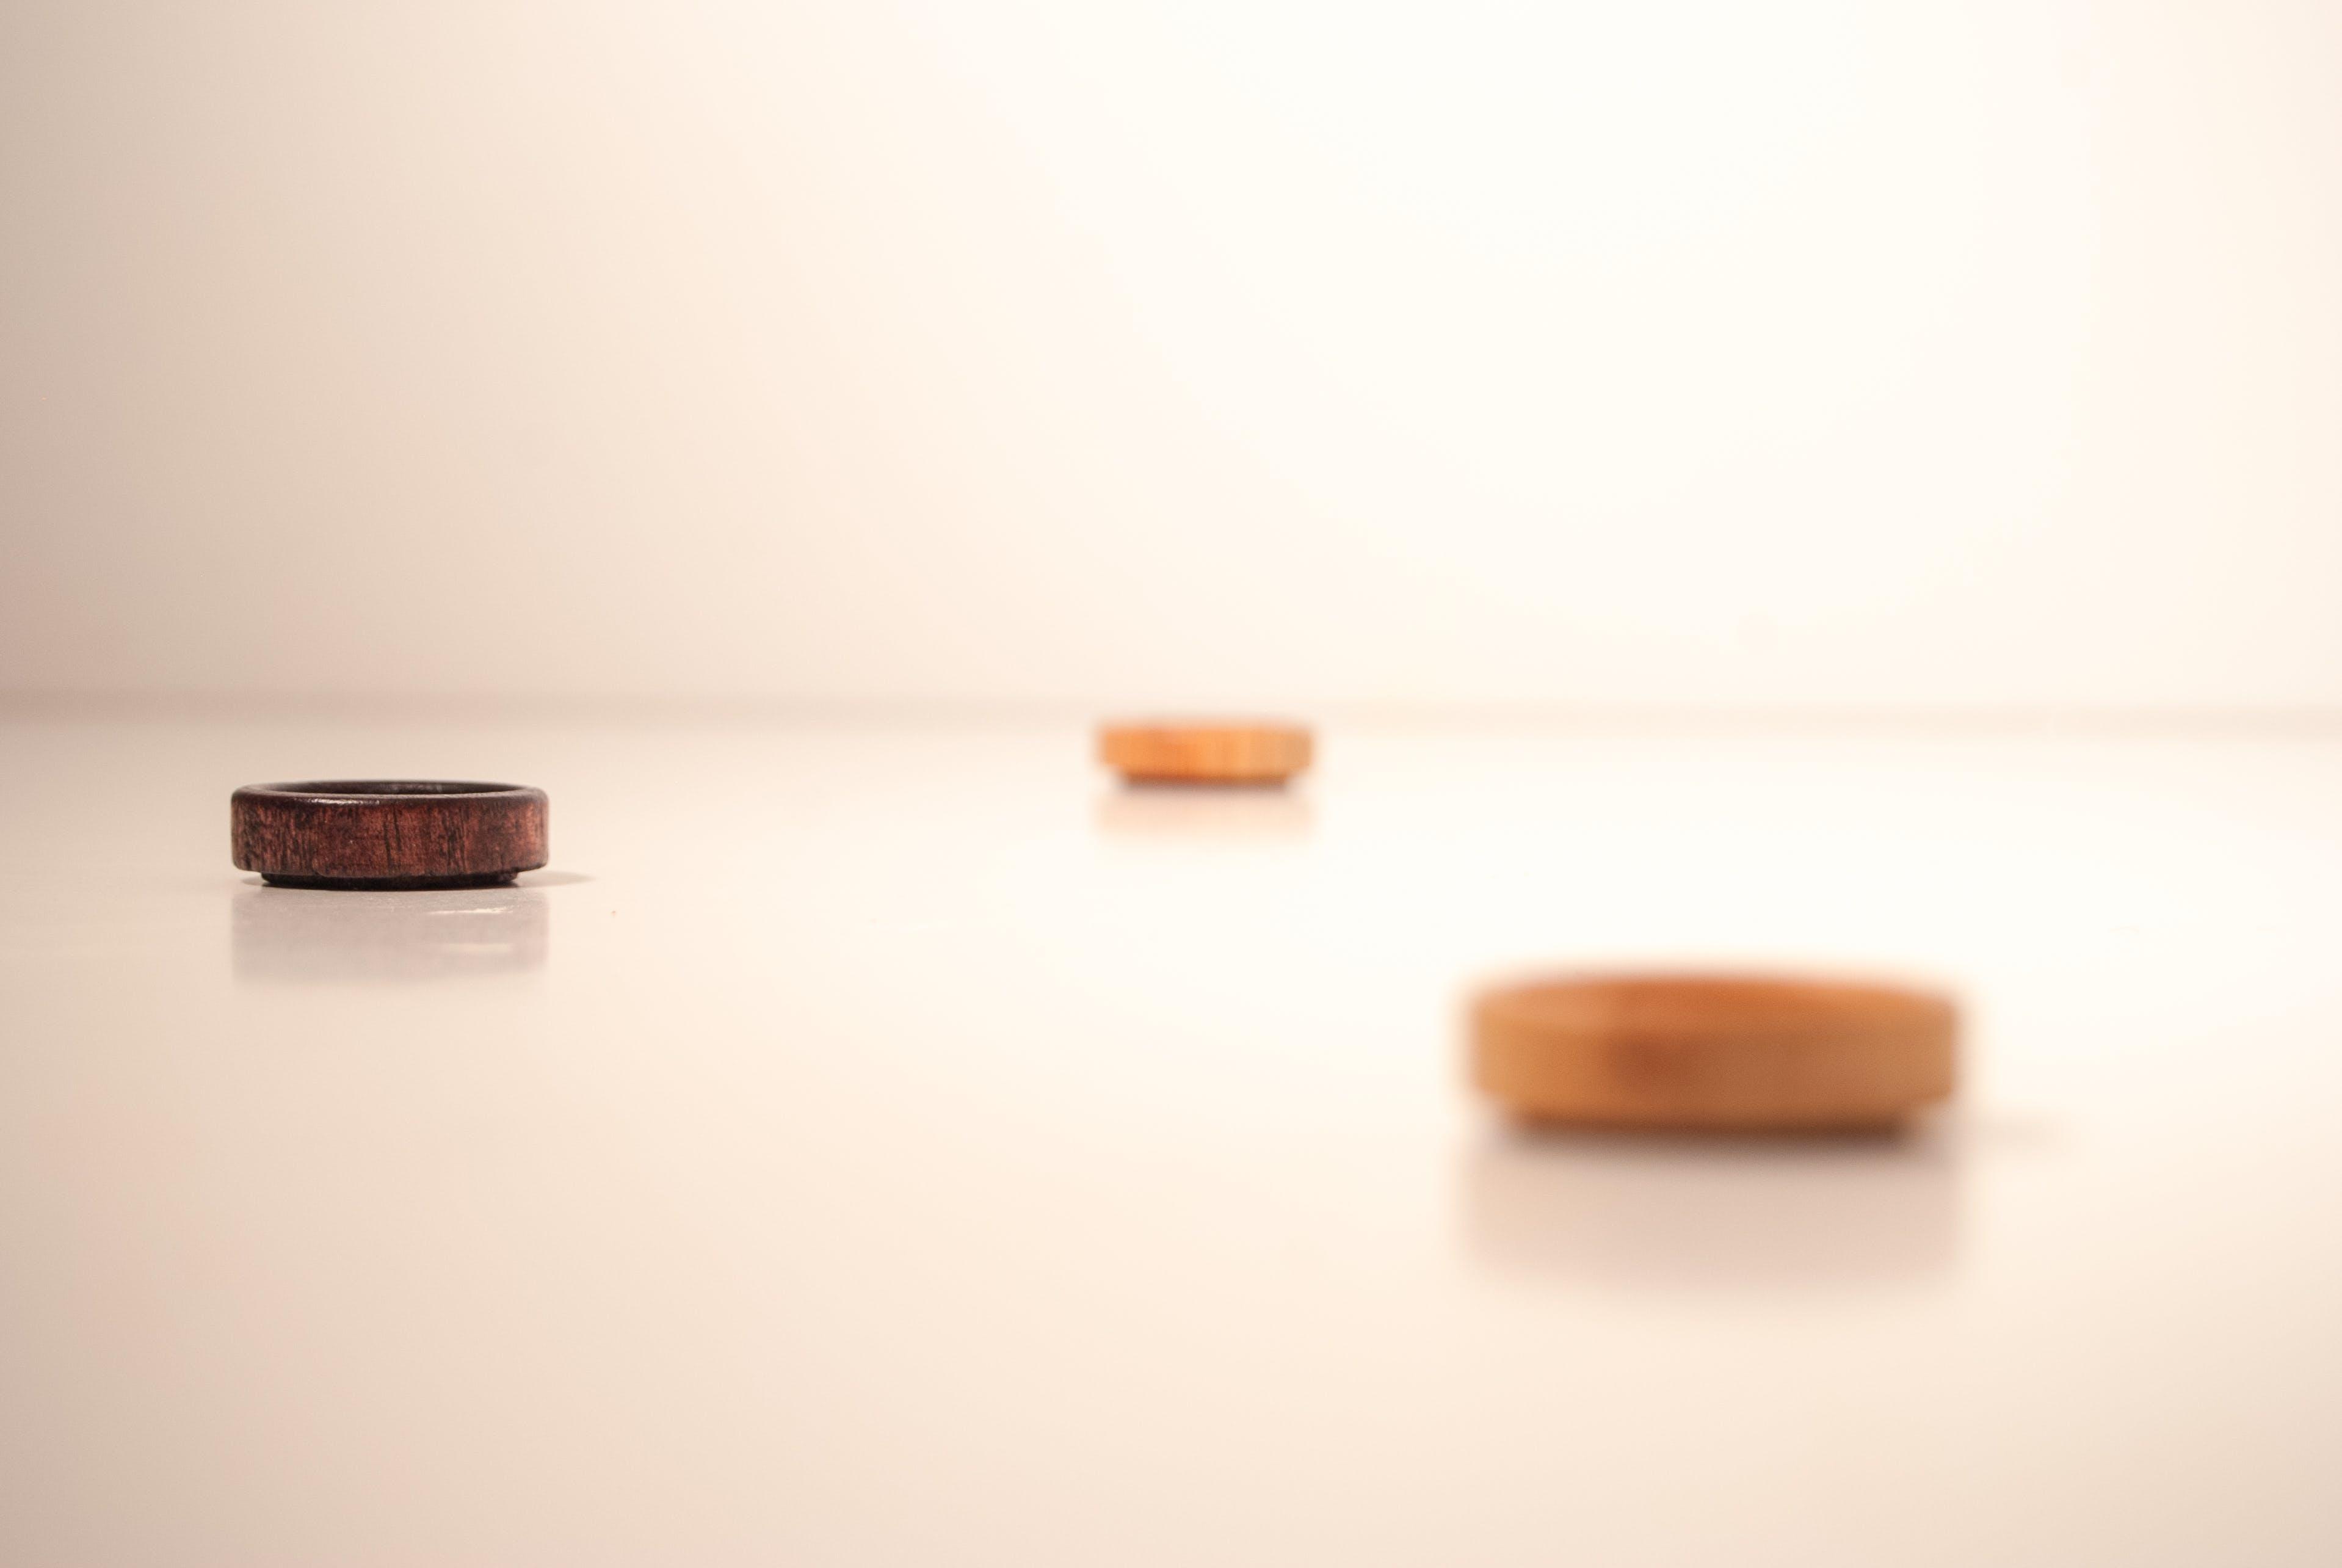 Several Medications Pills